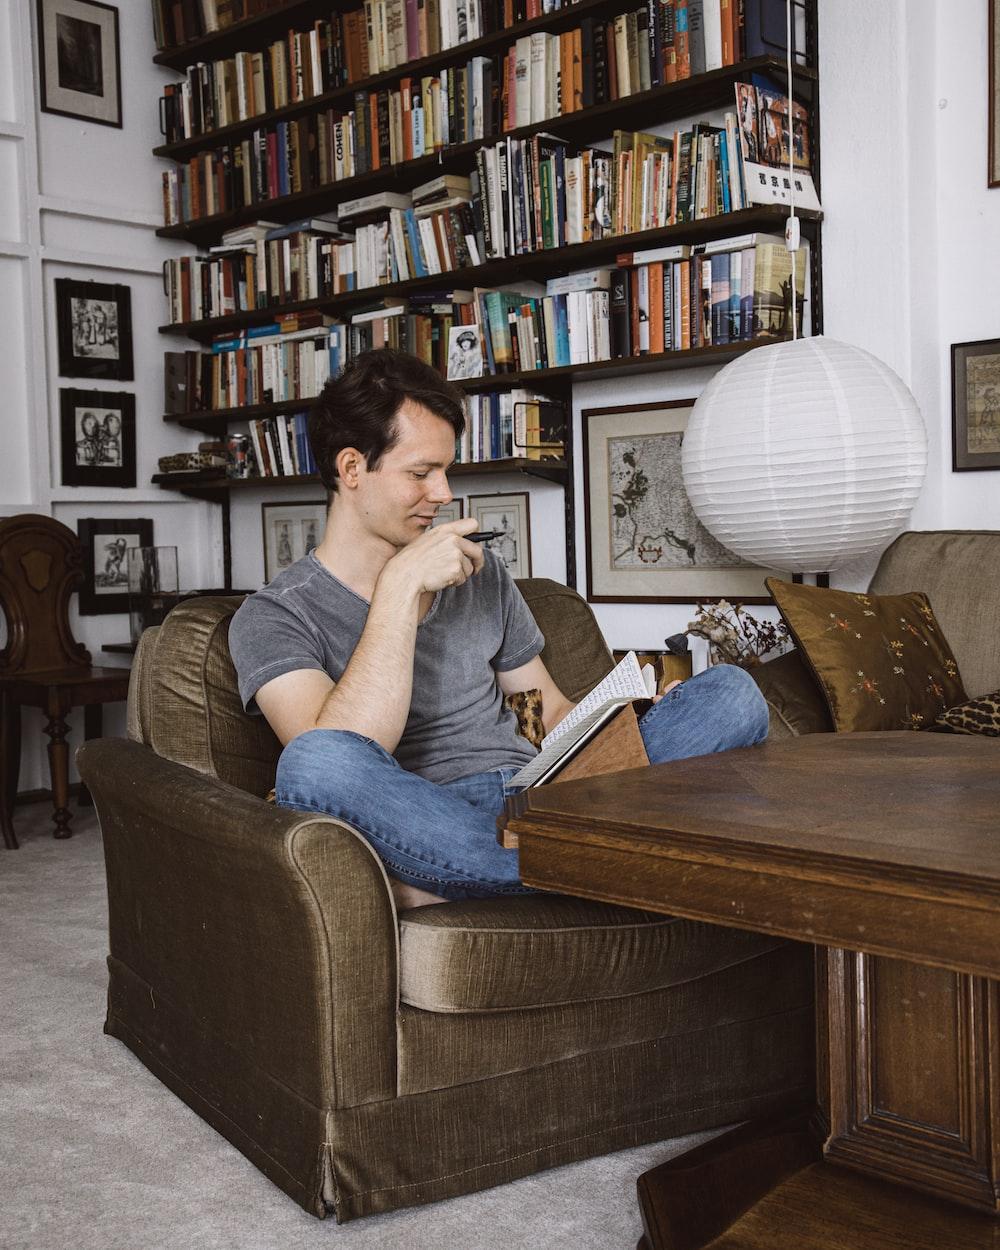 man sitting on sofa chair